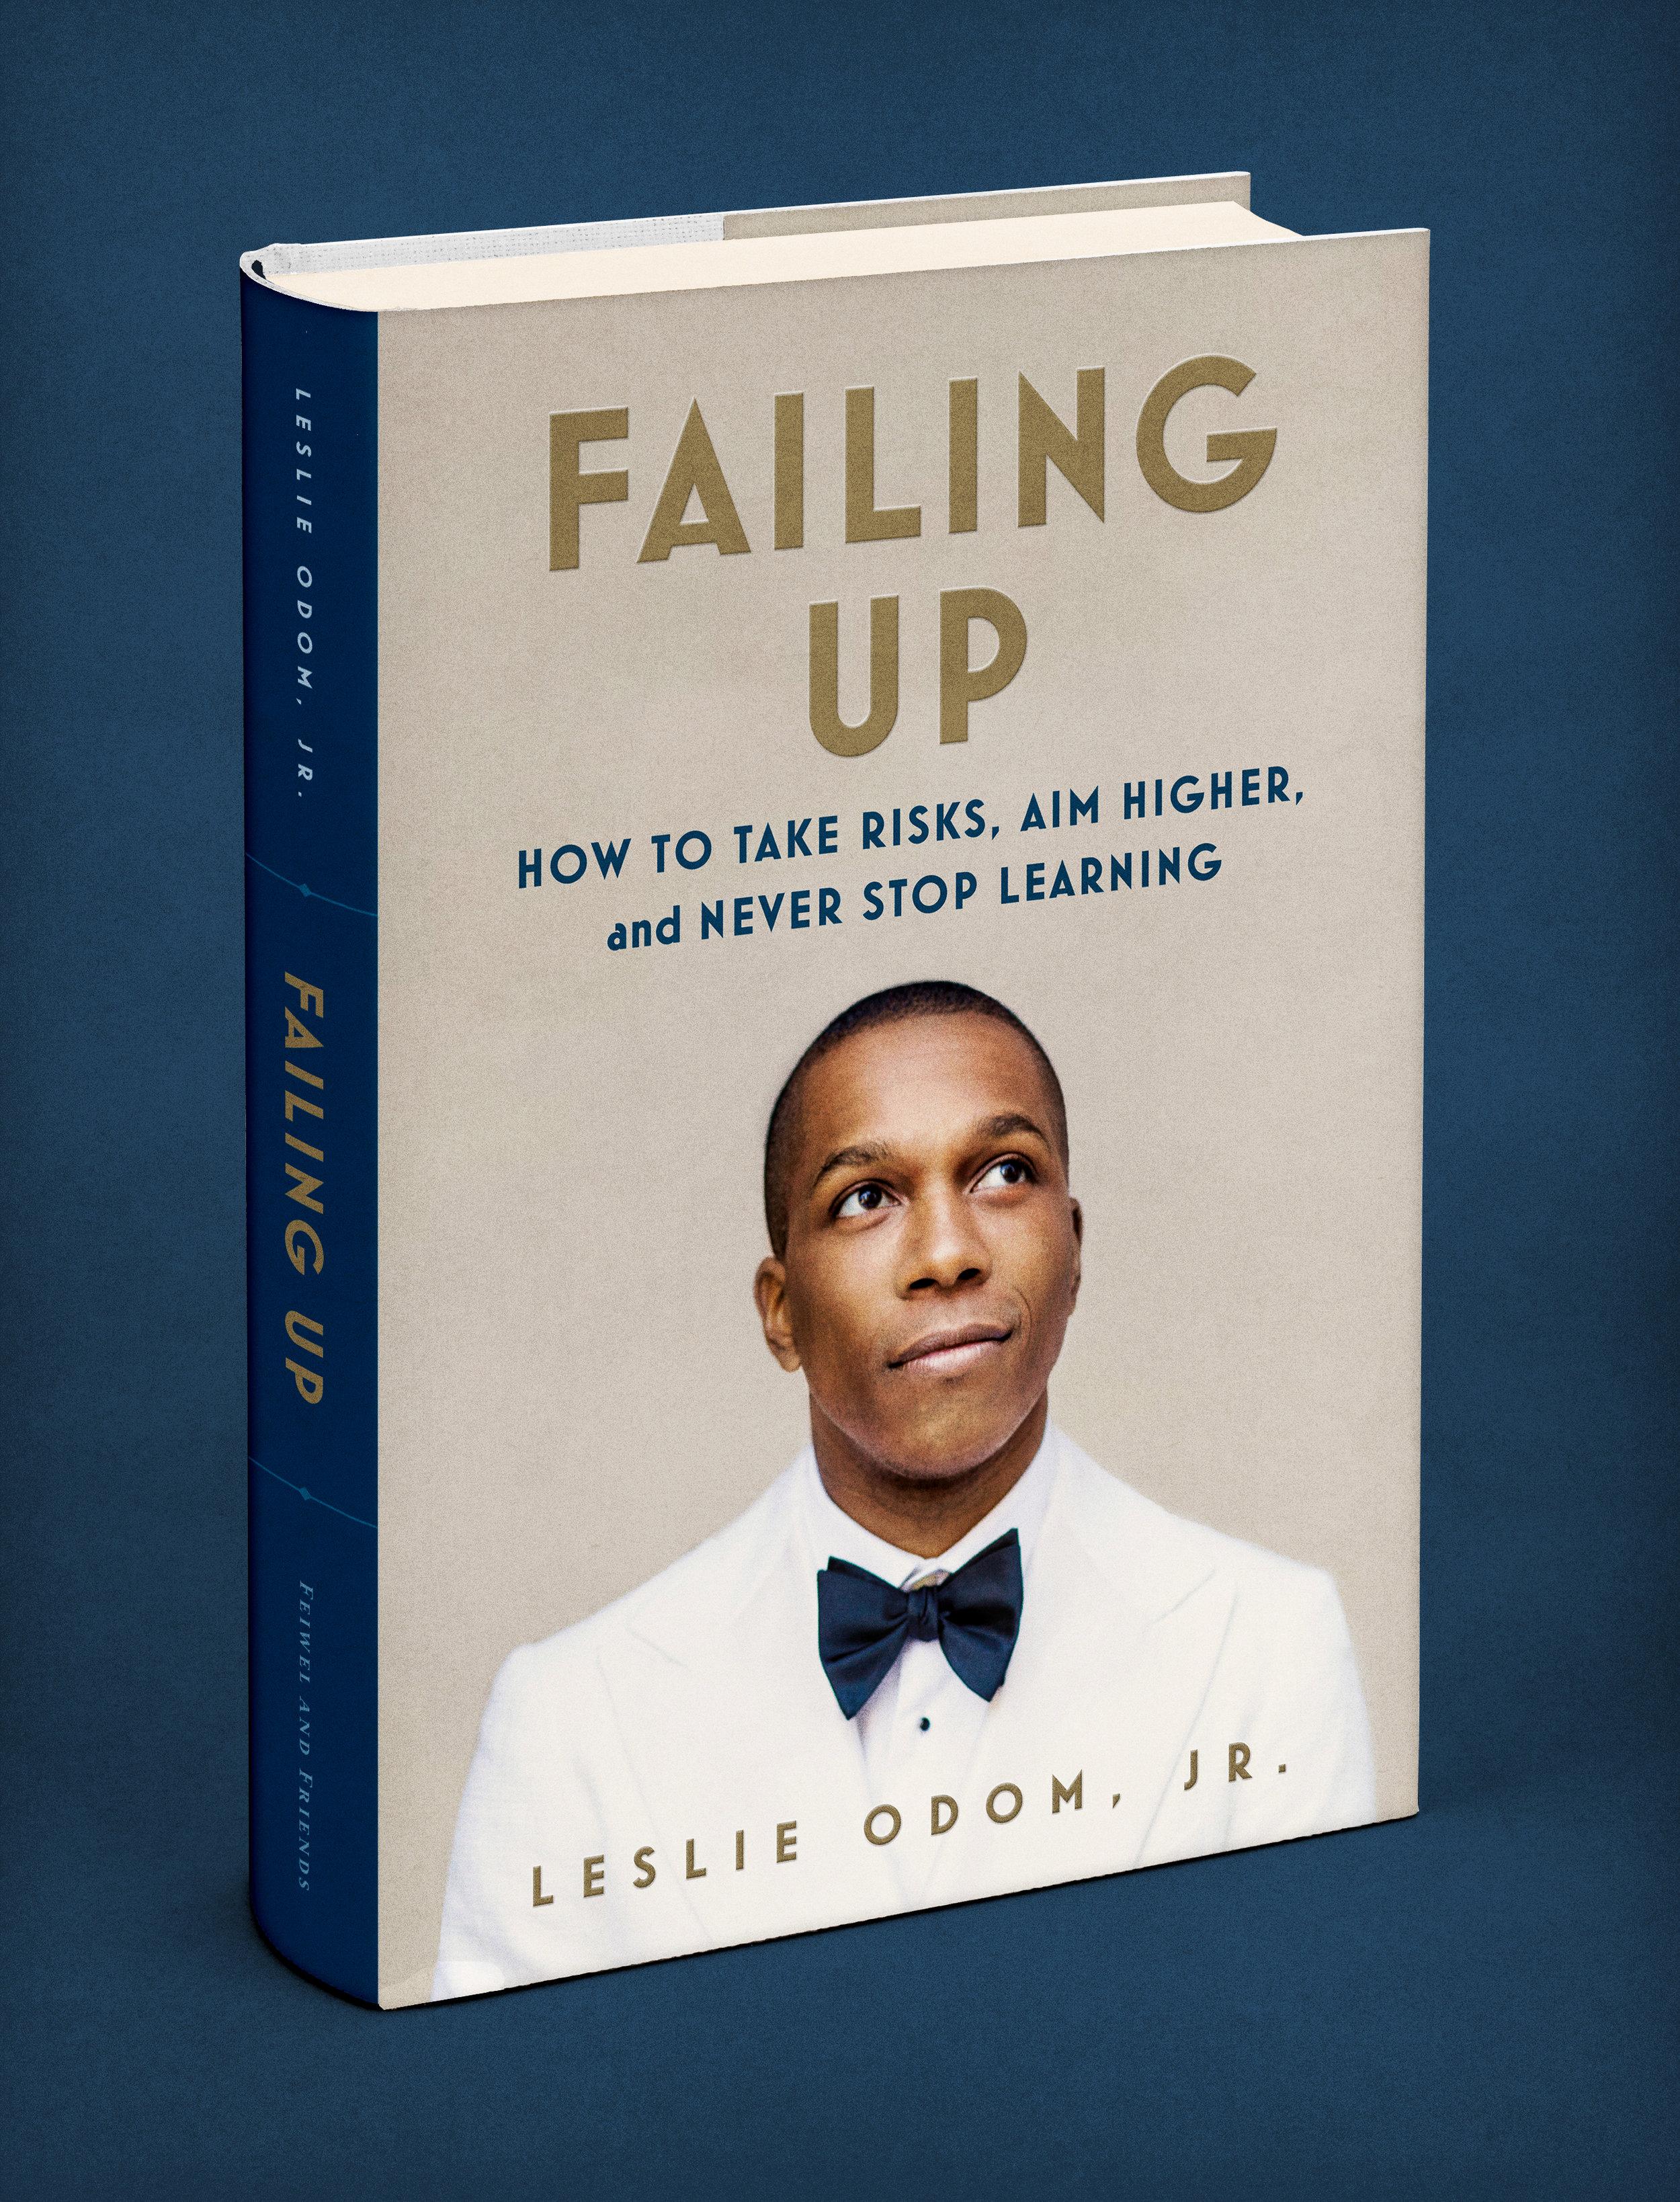 FailingUp_BookCover